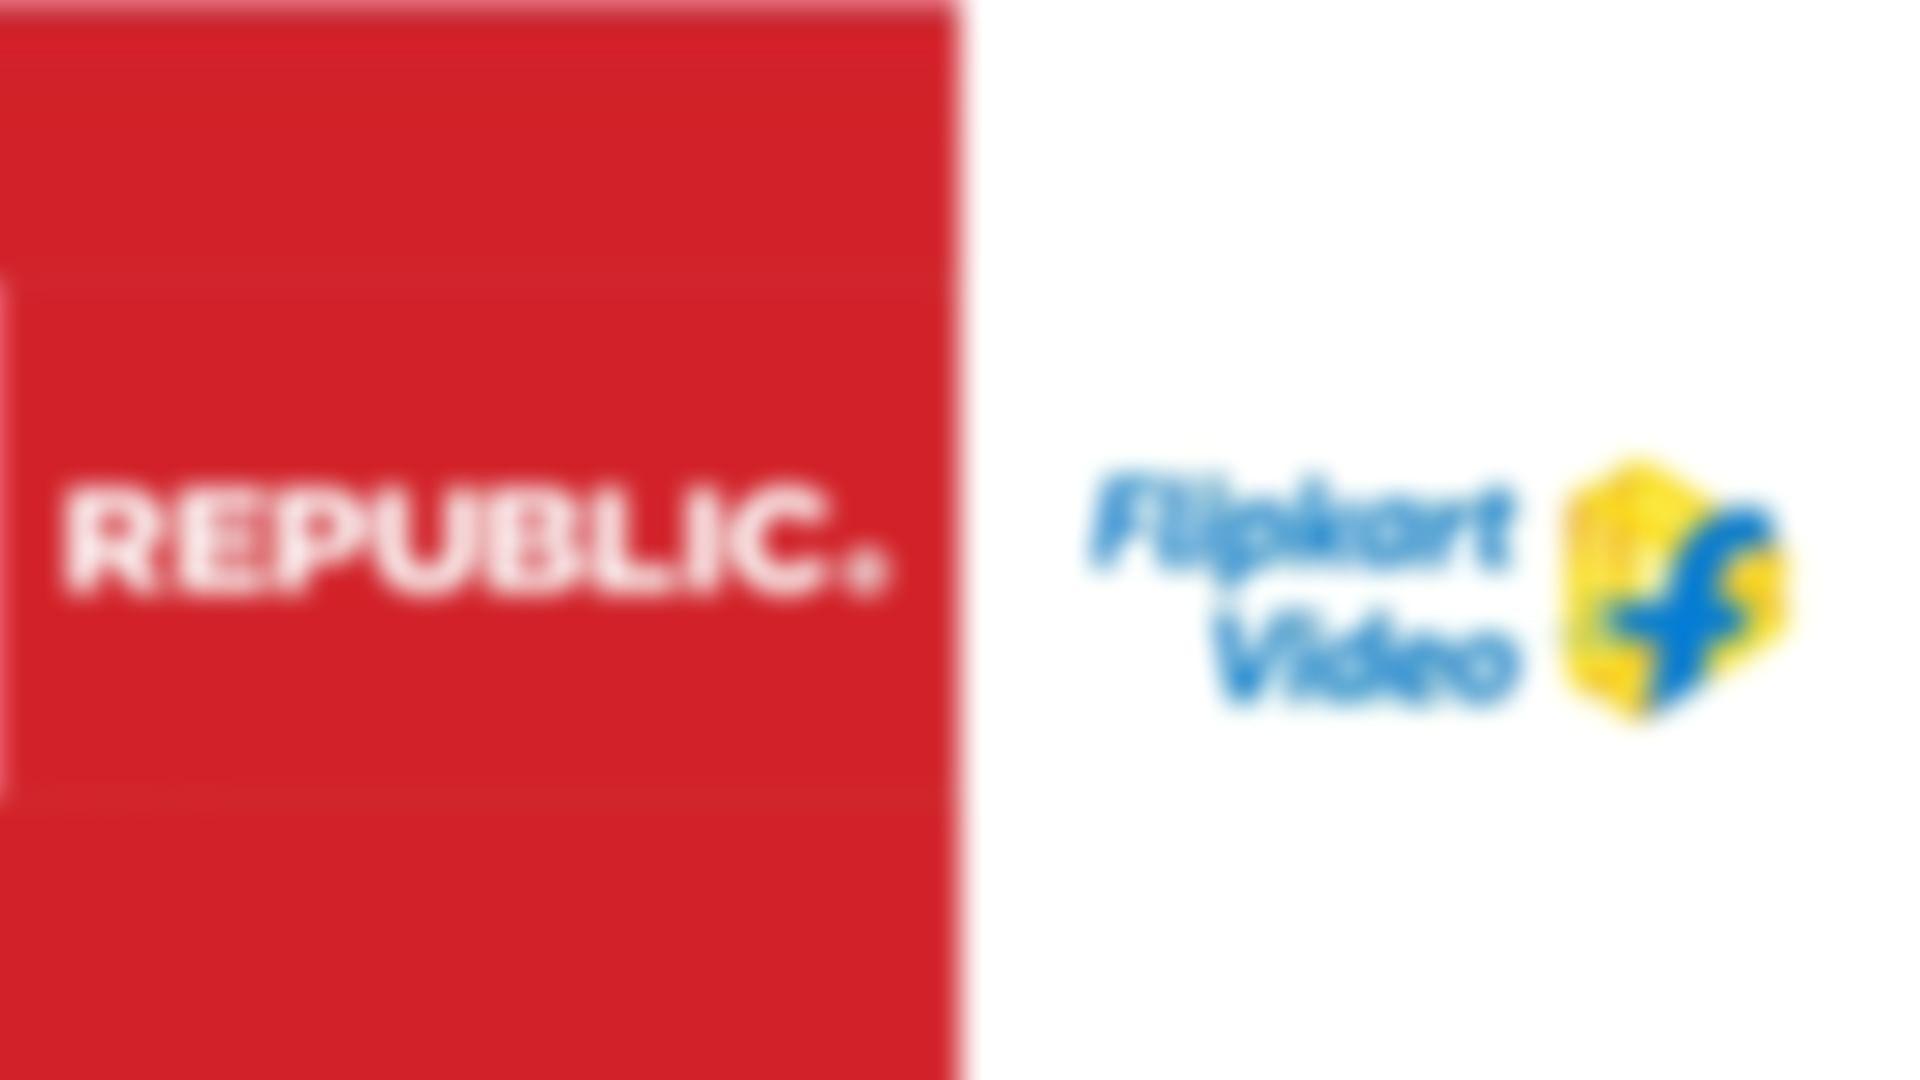 republic flipkart video